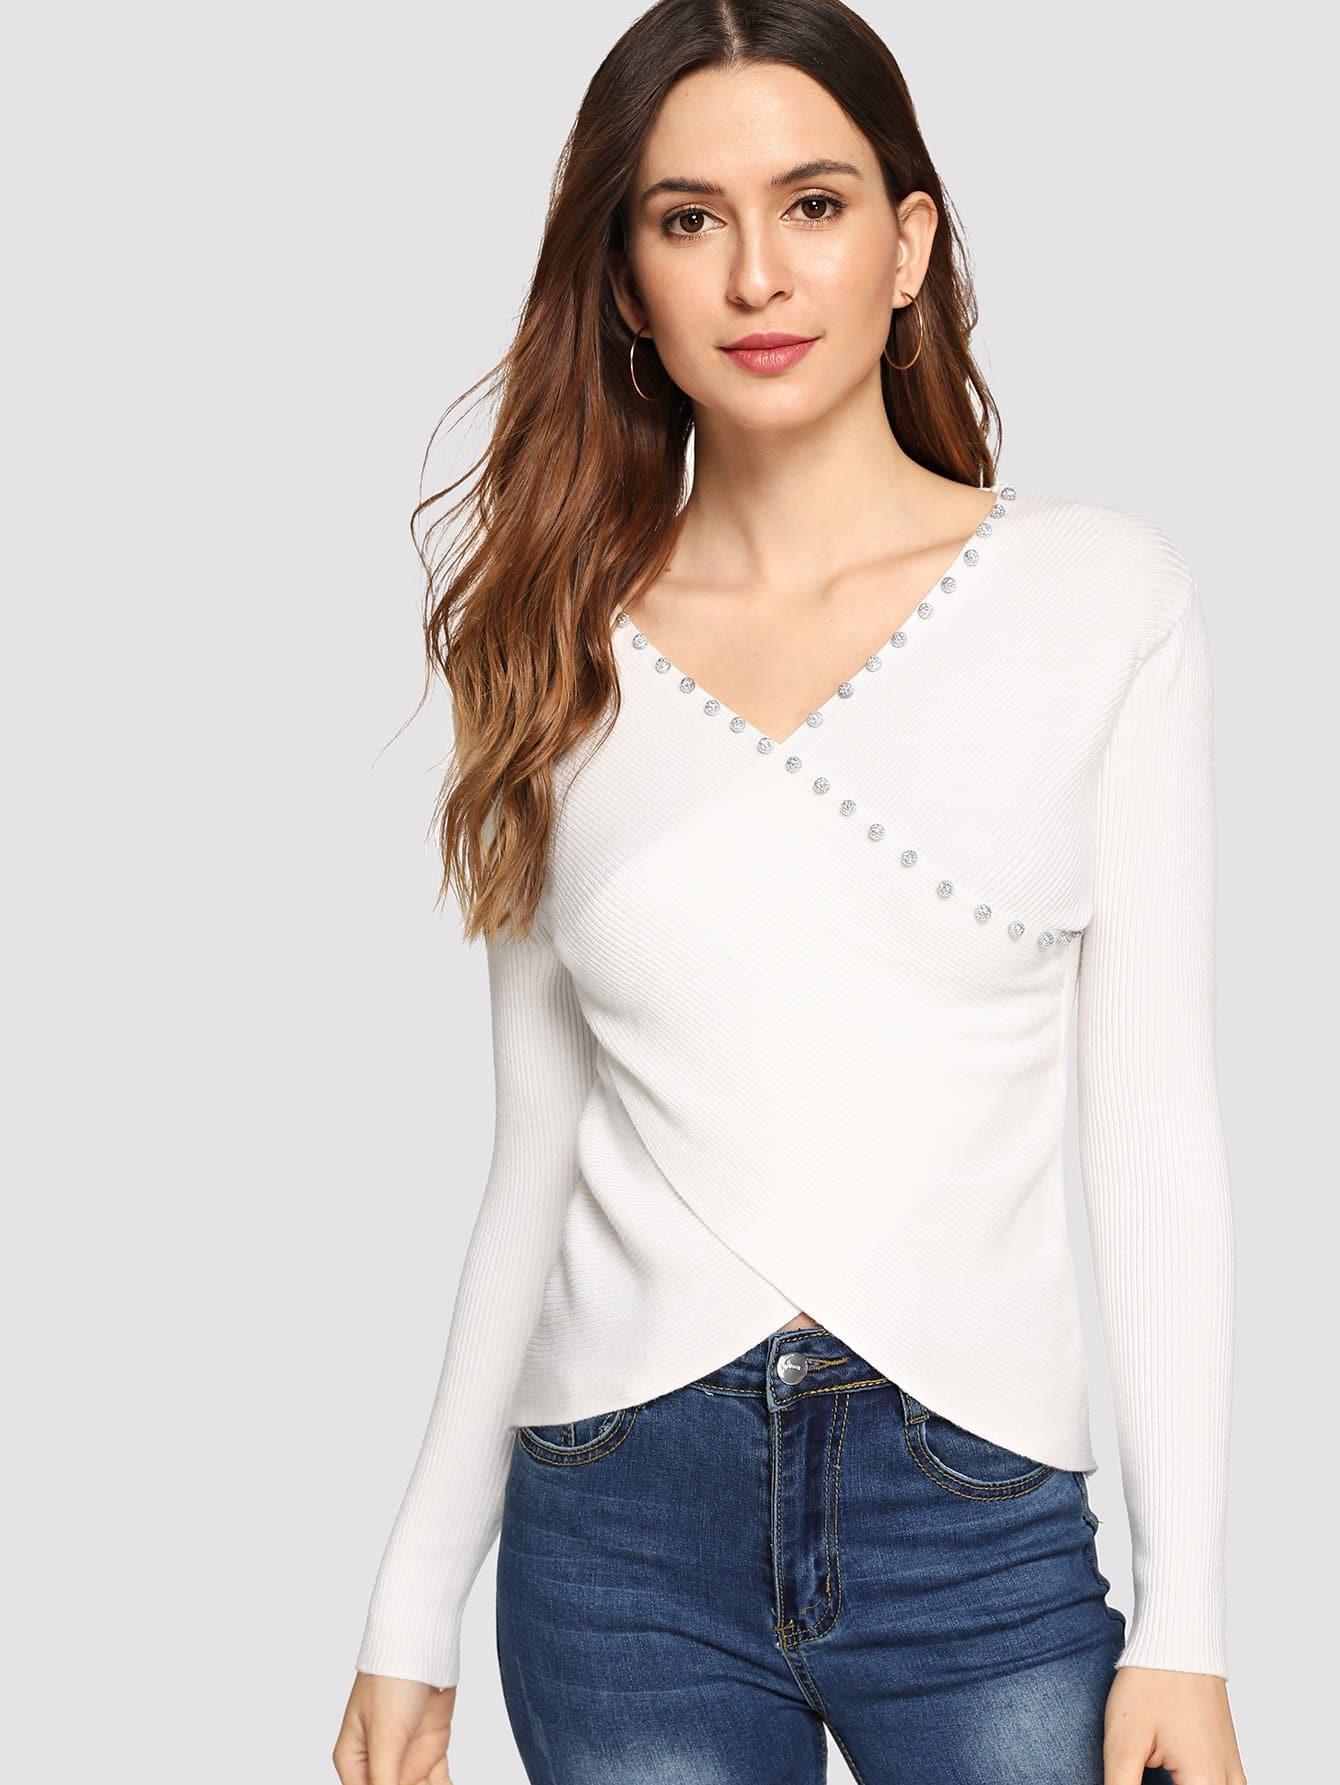 Reines Sweatshirt mit Perlen Dekor